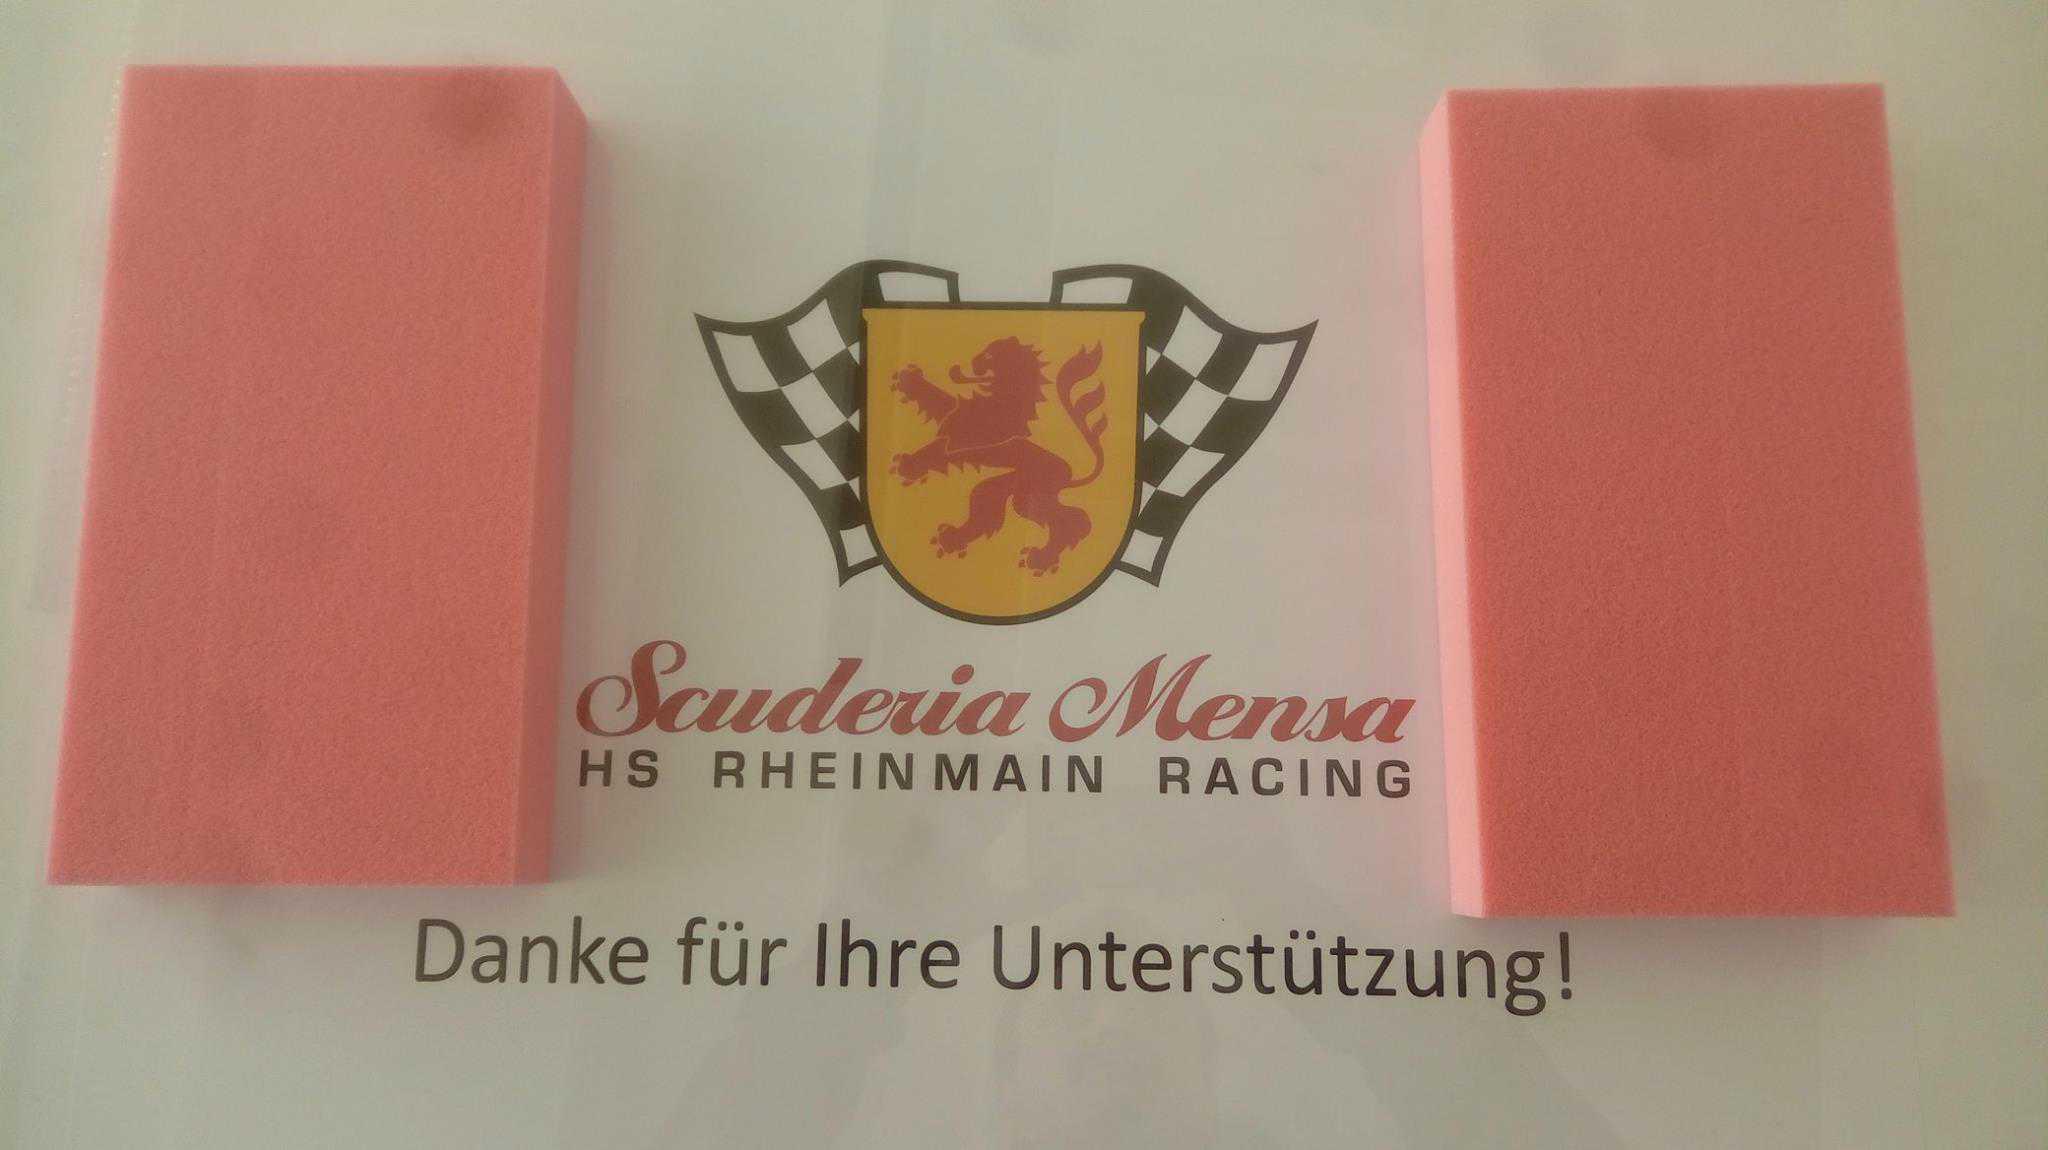 Scuderia-Mensa-Formula-Student